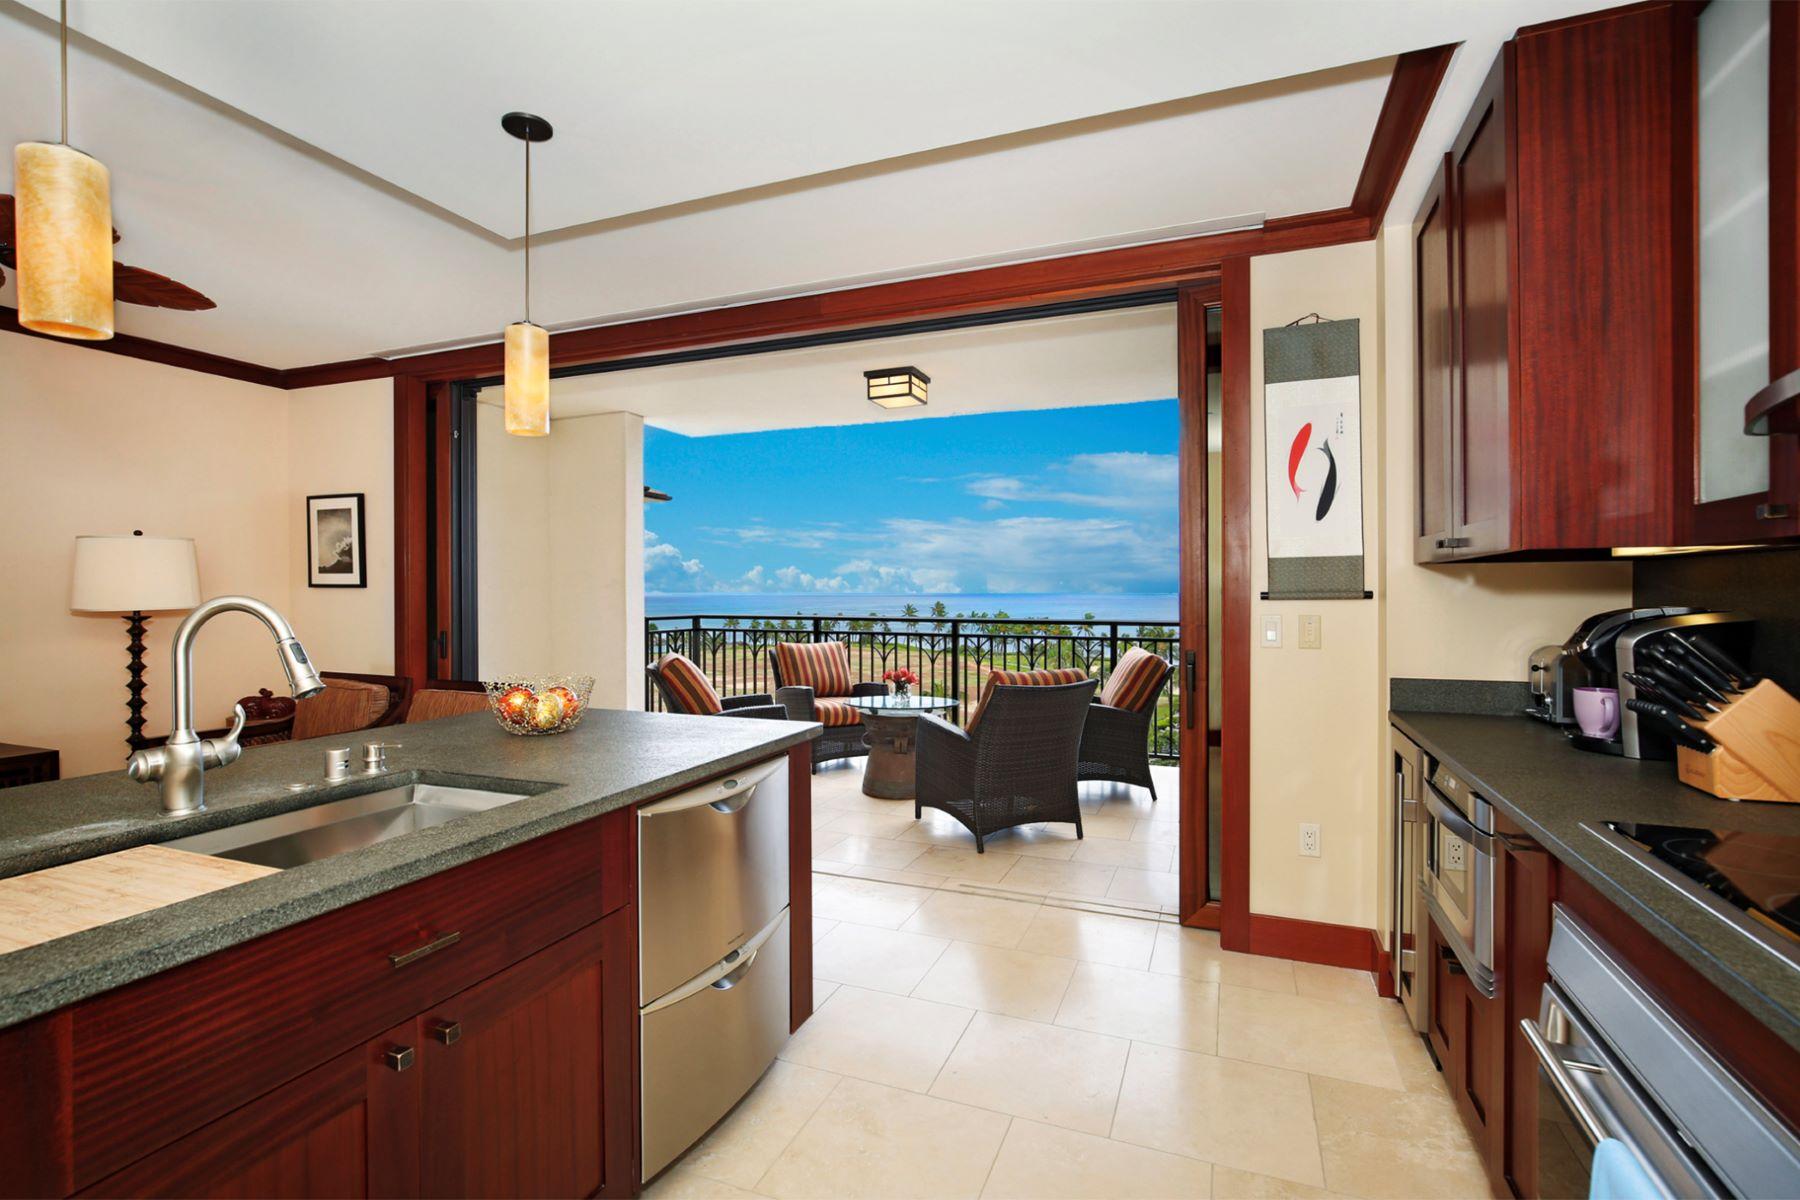 Condominiums for Sale at Beach Villas at Ko Olina, Luxury Condo, Kapolei, Ocean Views 92-104 Waialii Place #O-803 Kapolei, Hawaii 96707 United States